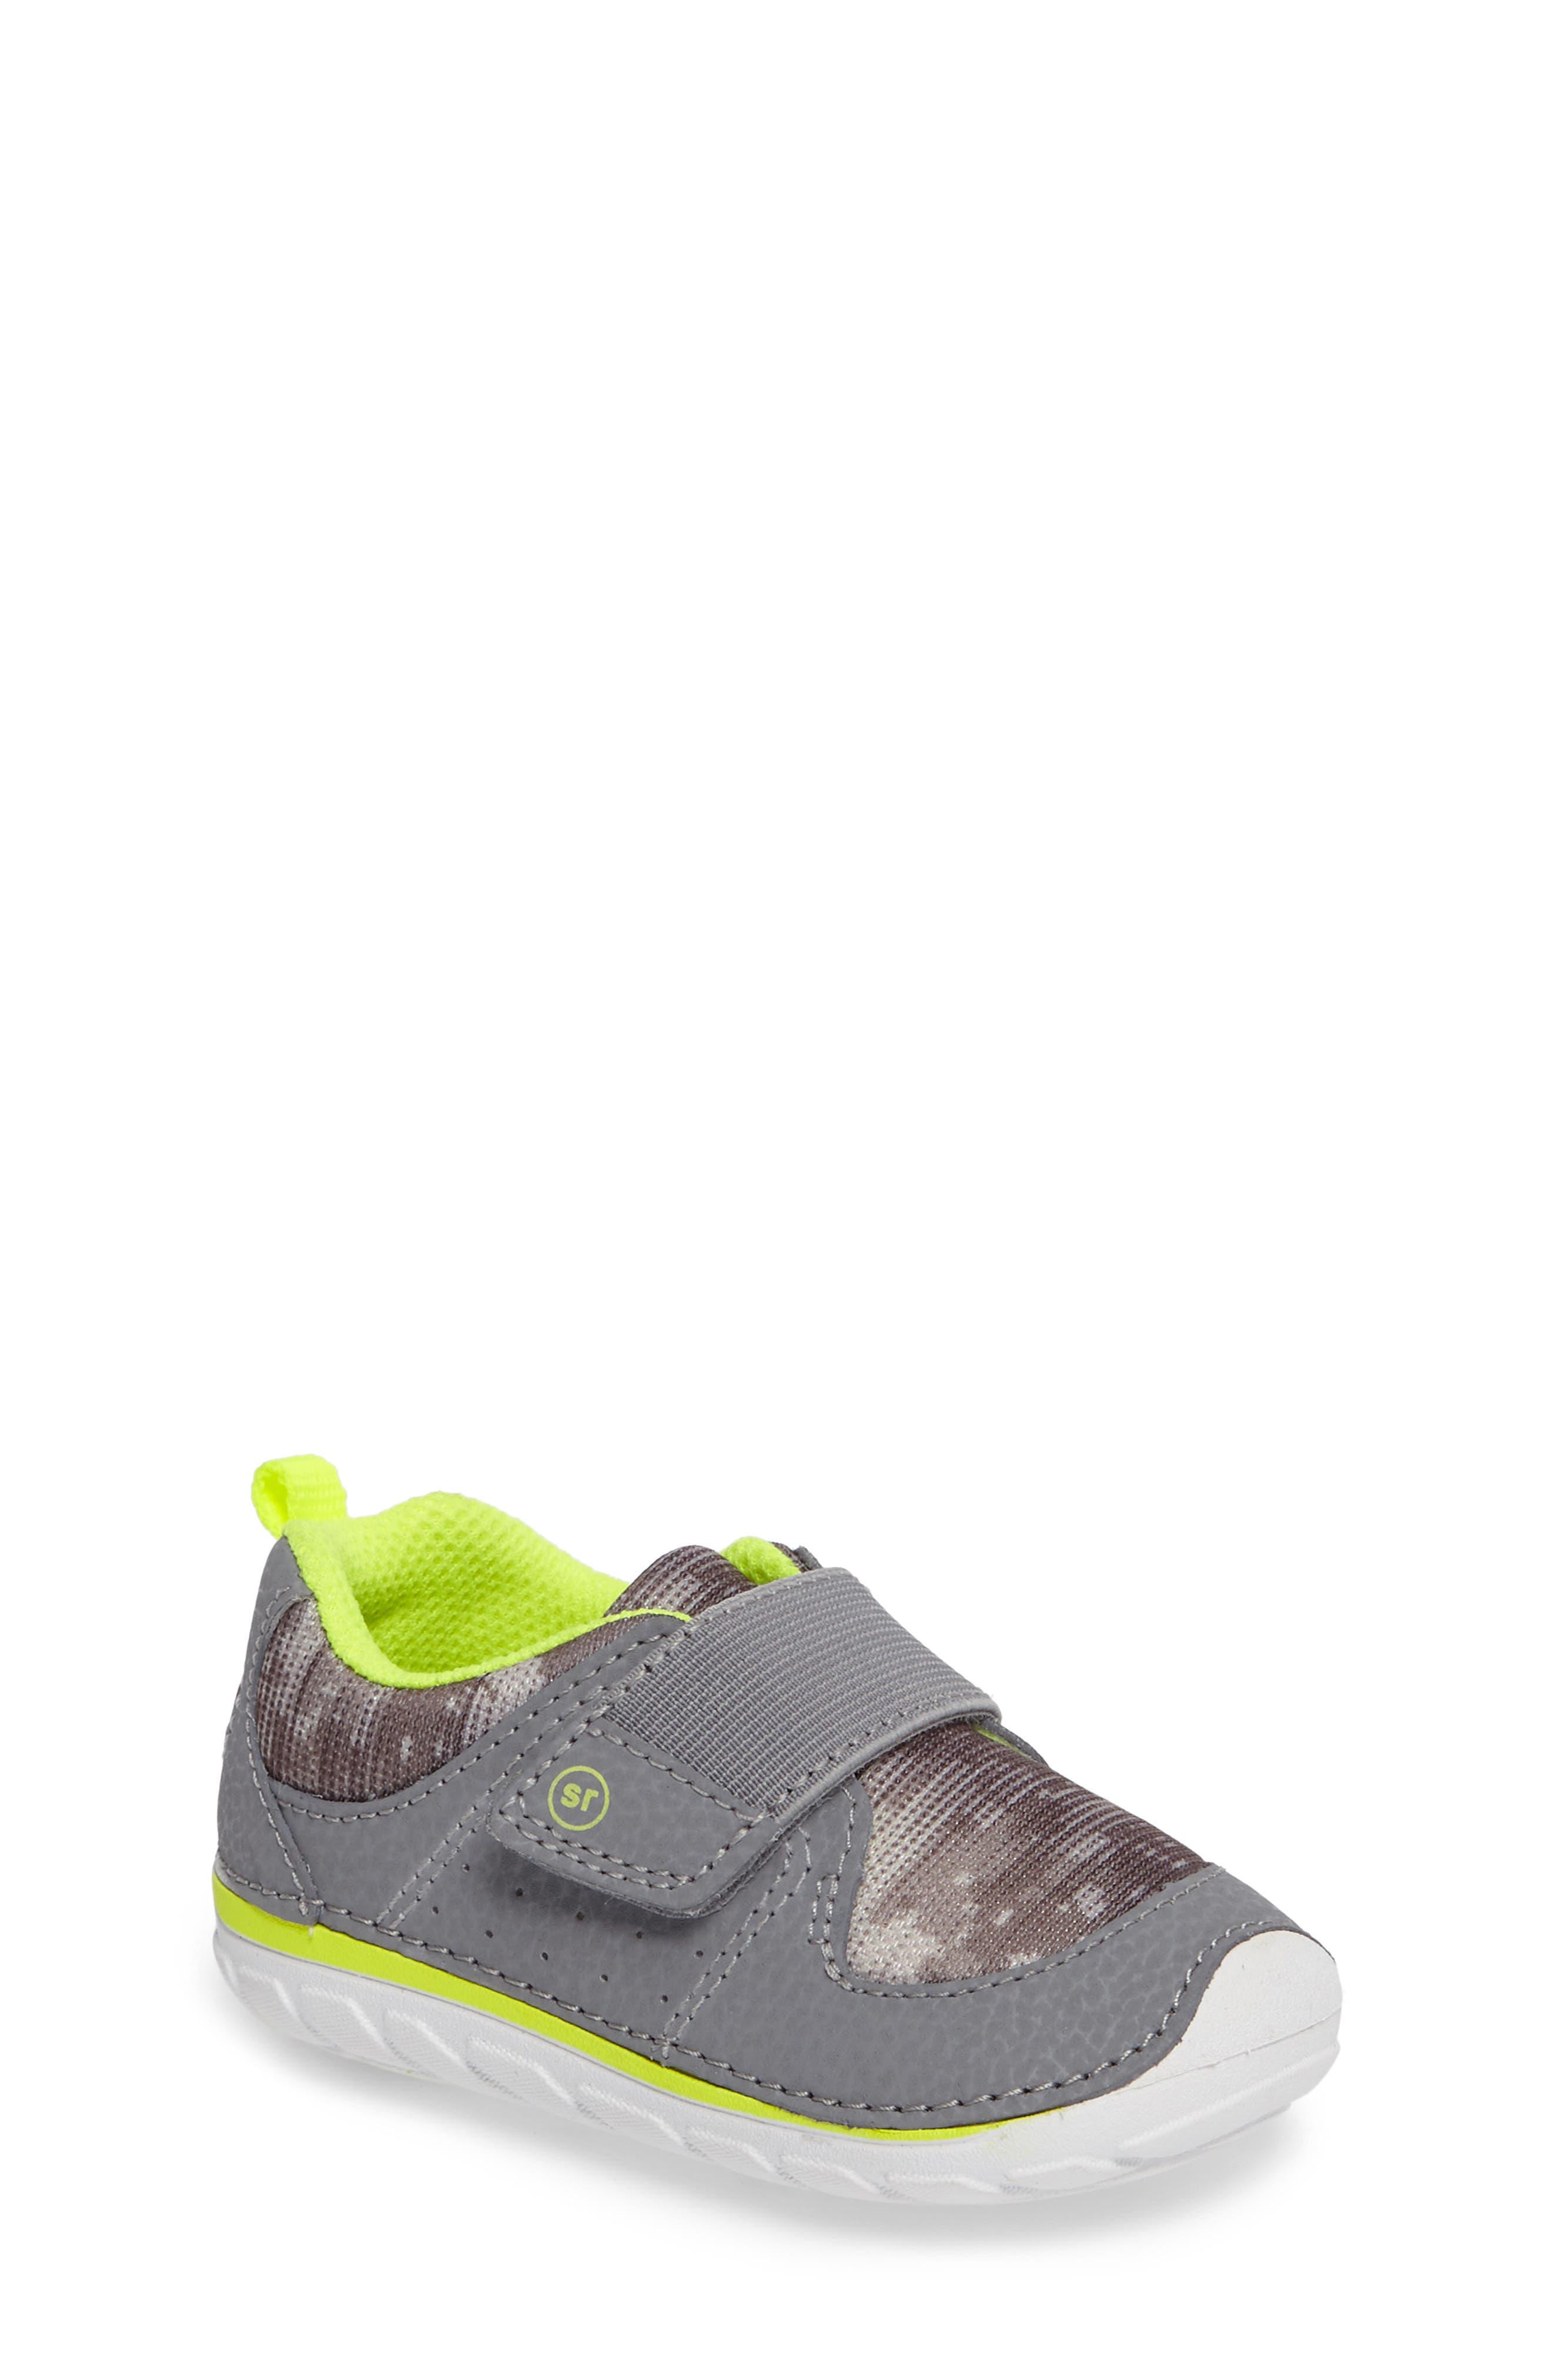 STRIDE RITE Soft Motion<sup>™</sup> Ripley Sneaker